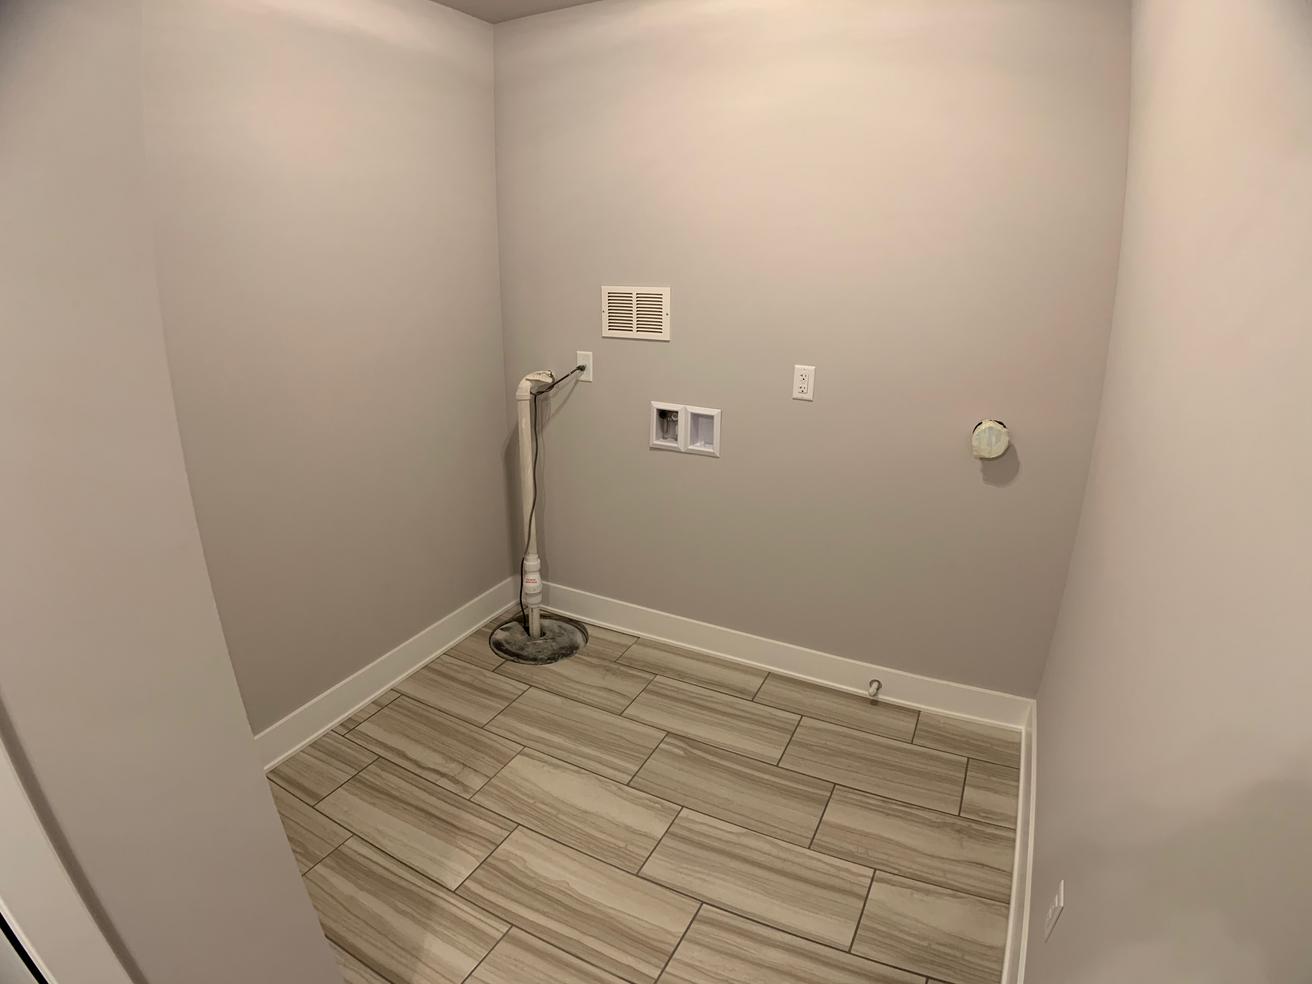 Harrison Laundry Room 1